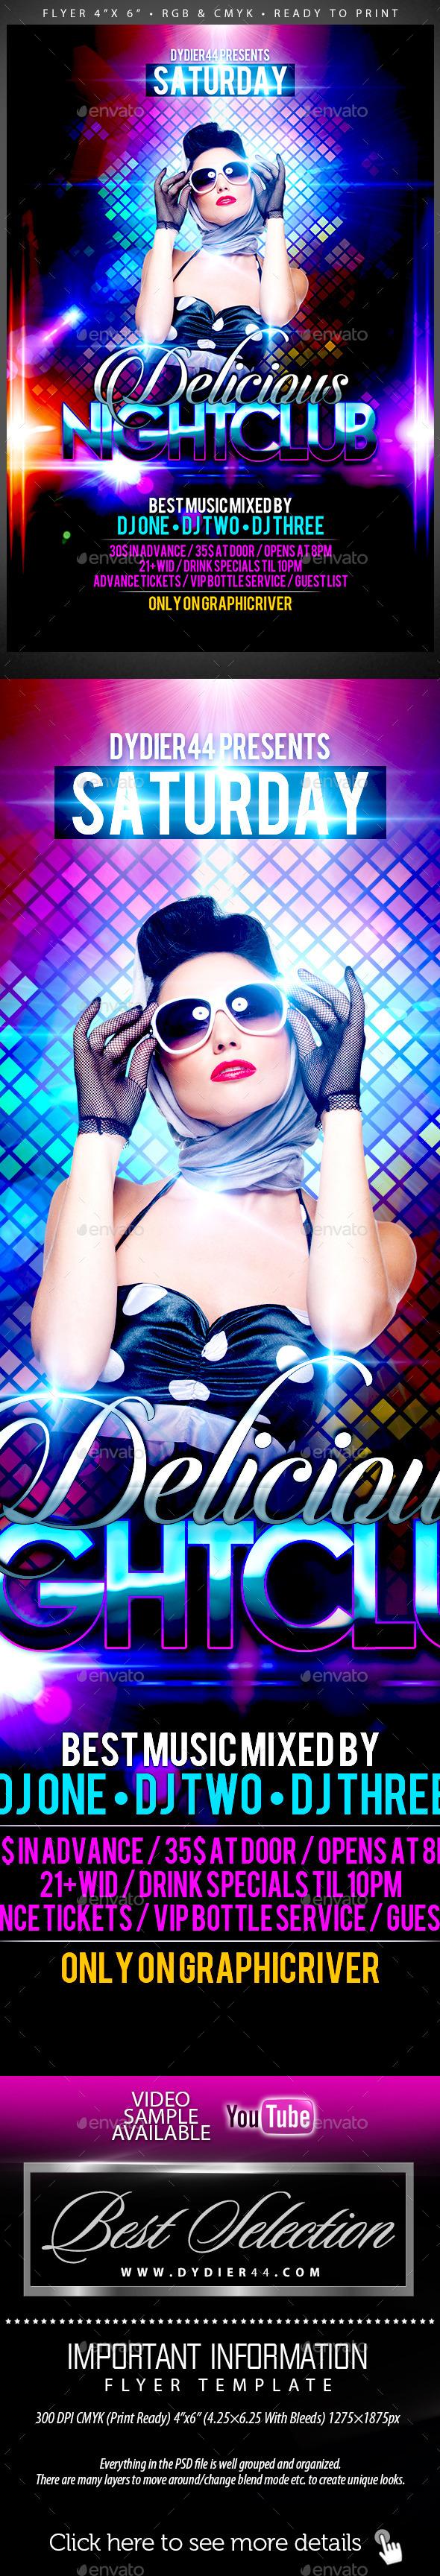 GraphicRiver Delicious Nightclub Flyer Template 4x6 8825772